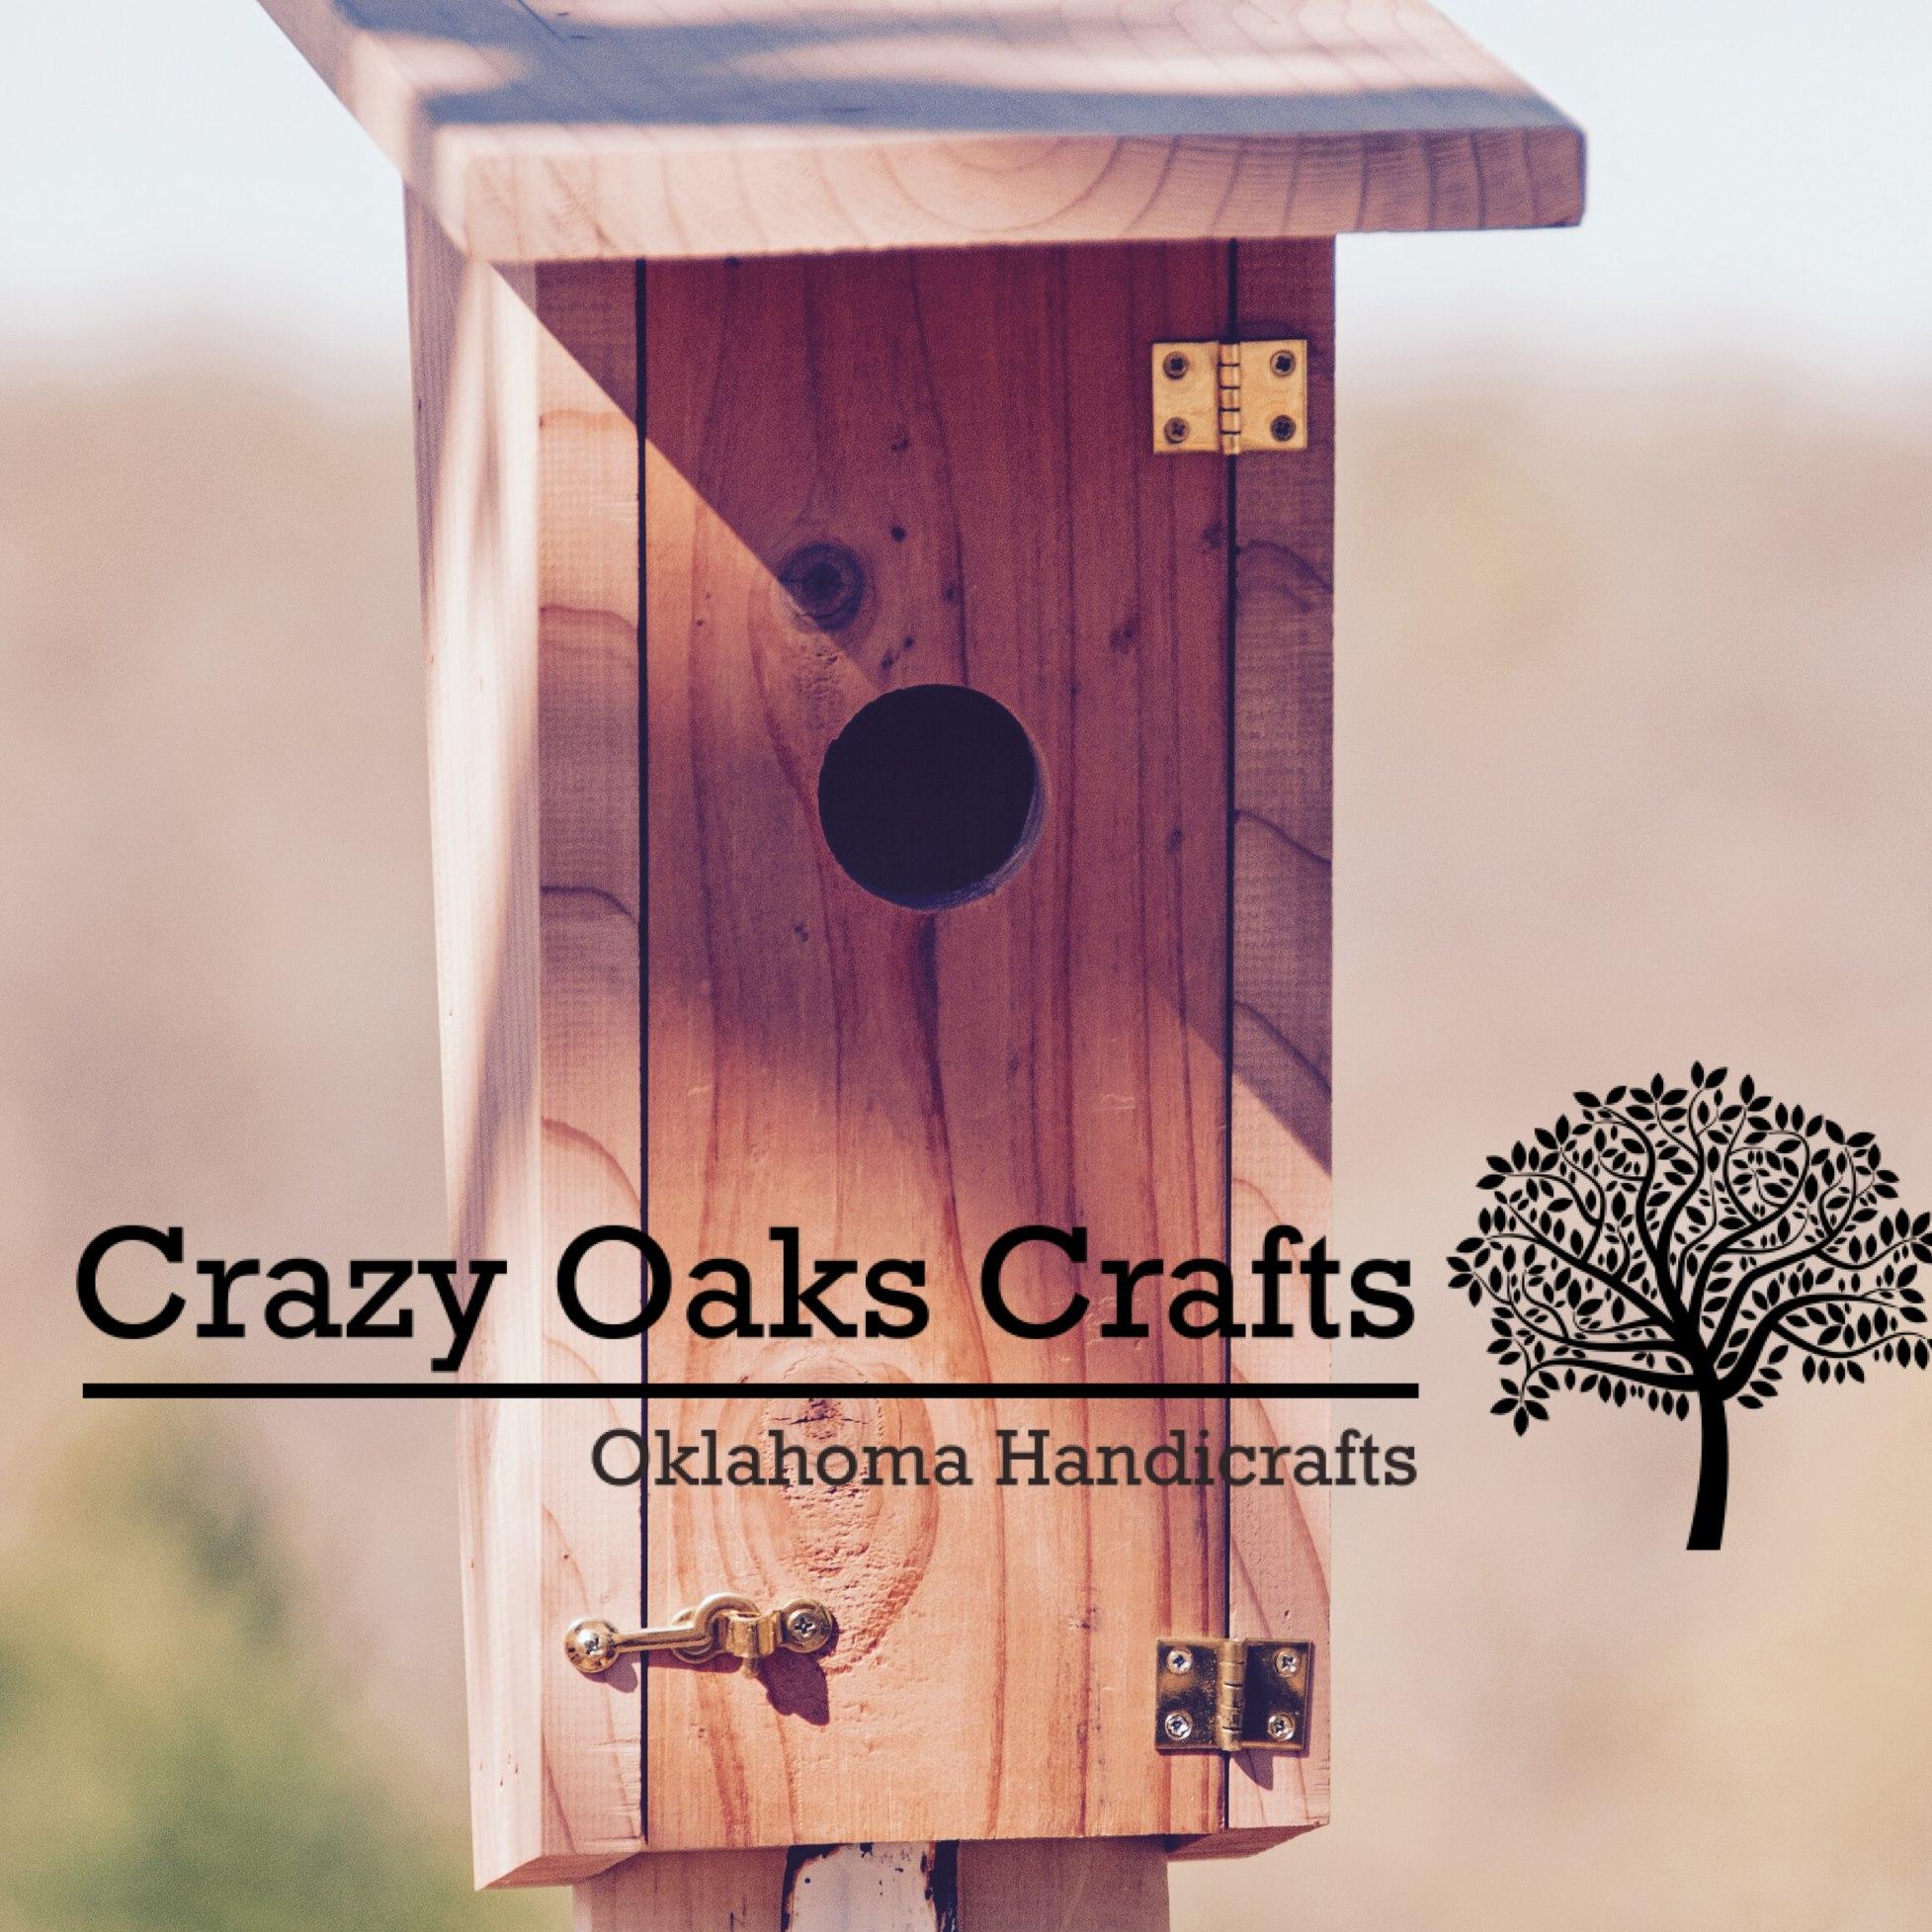 Crazy Oaks Crafts Oklahoma Handicrafts